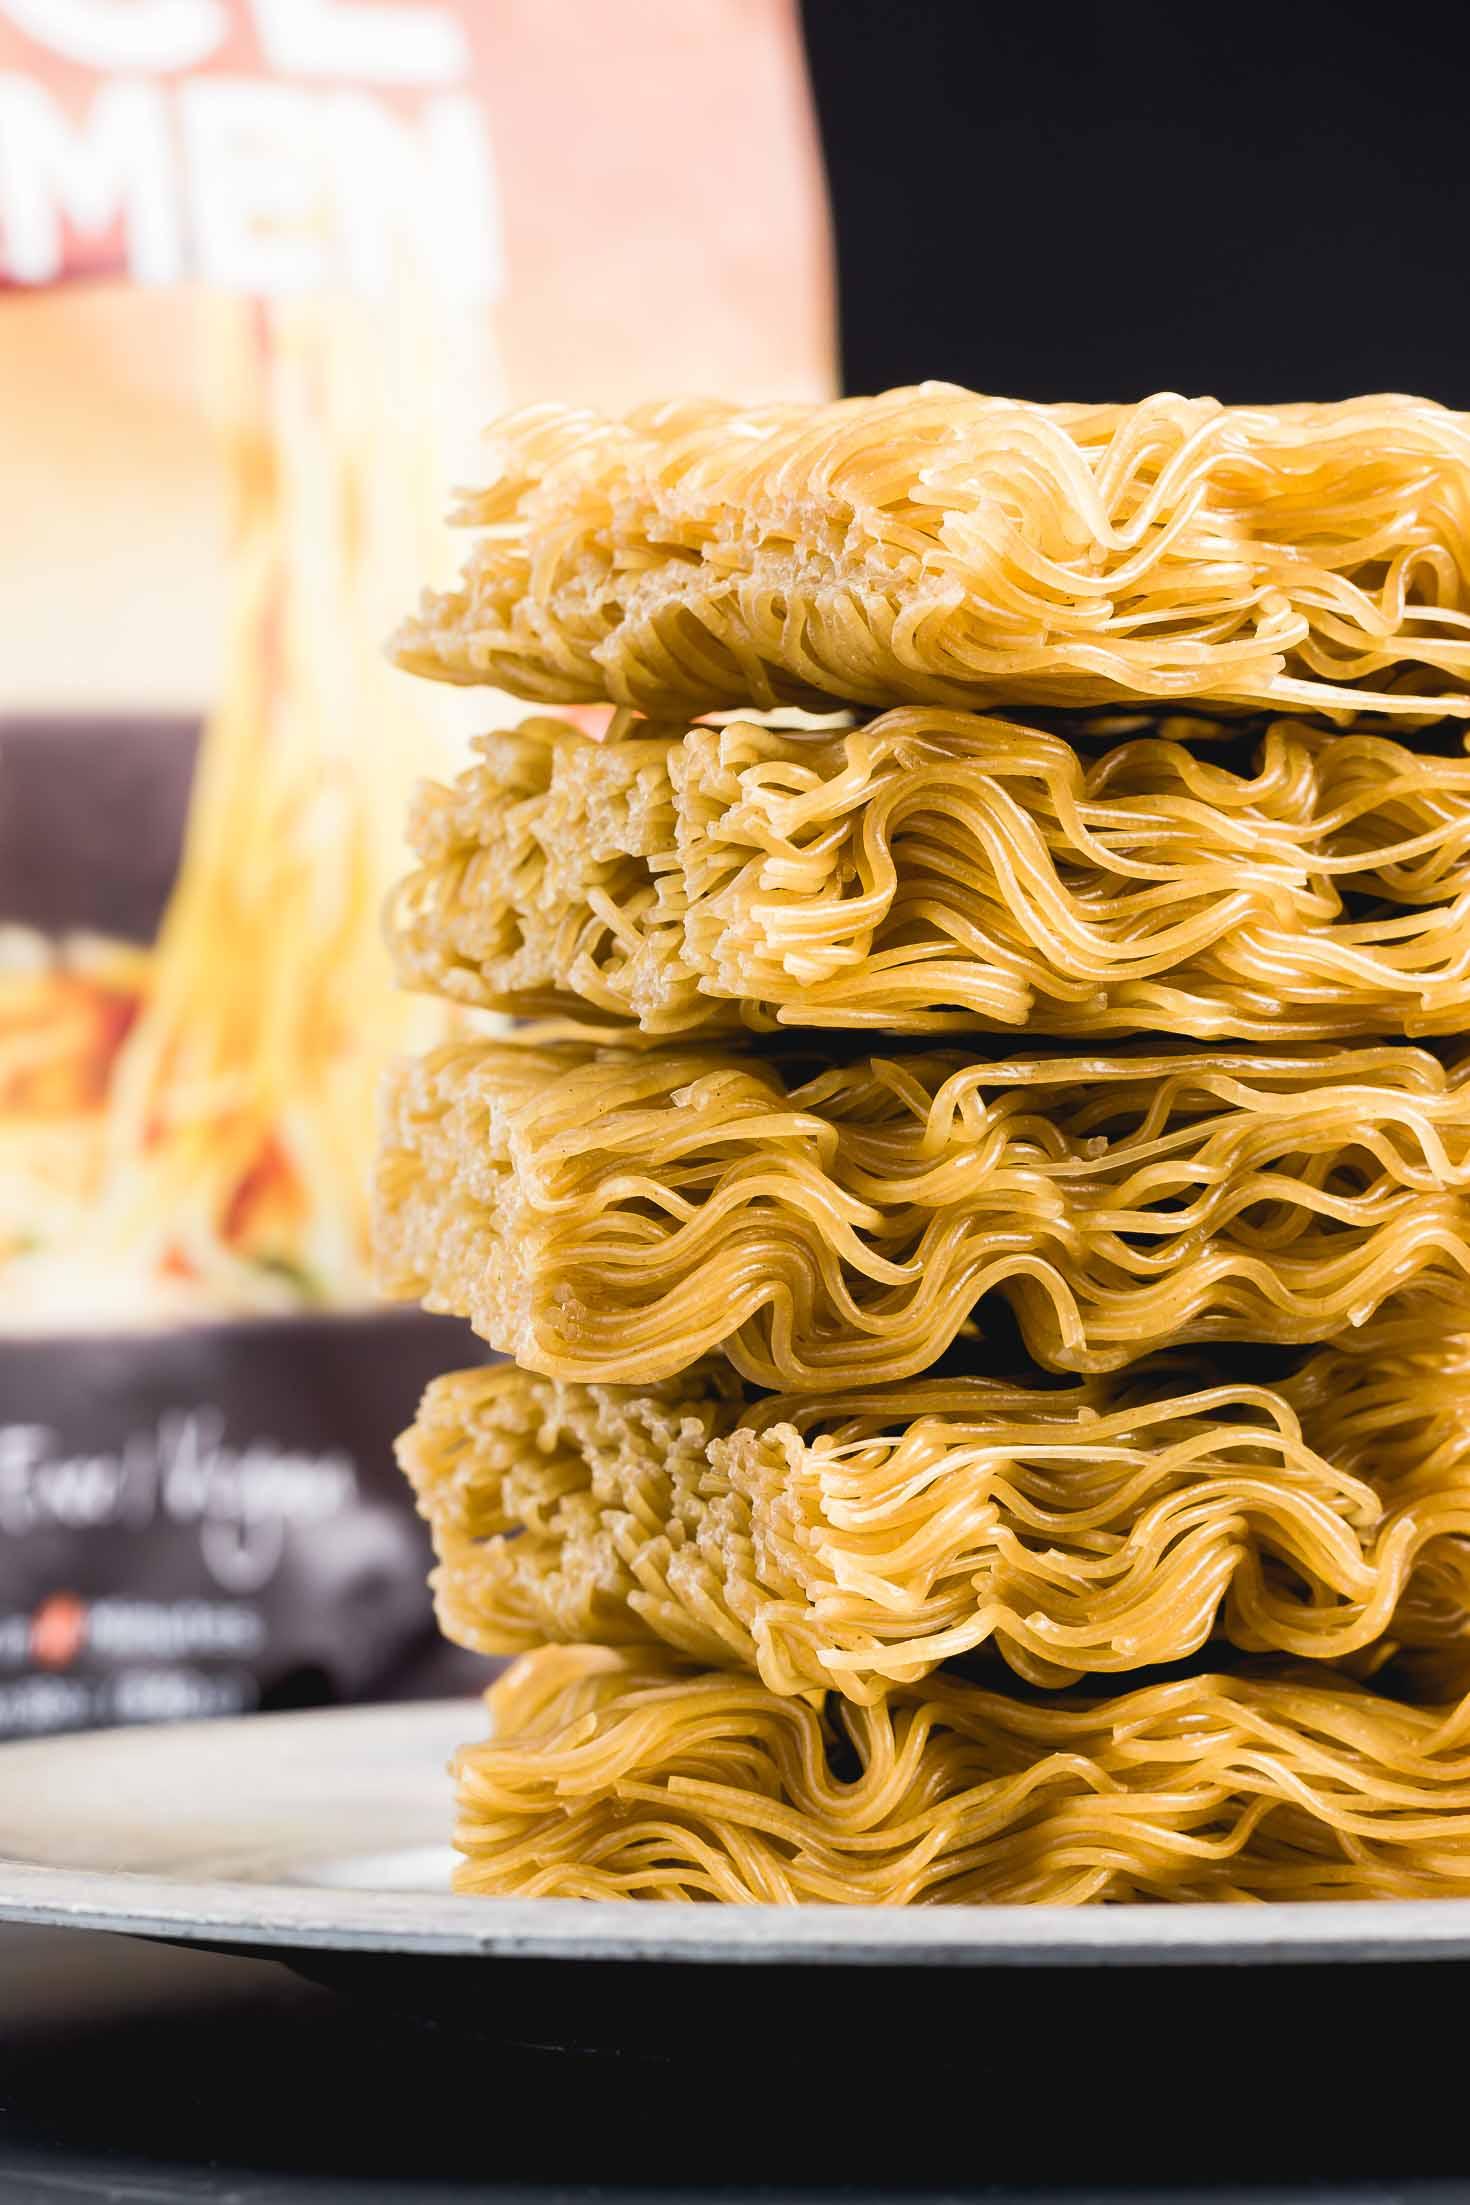 Lotus Brand Gluten-free Ramen-5 pieces stacks